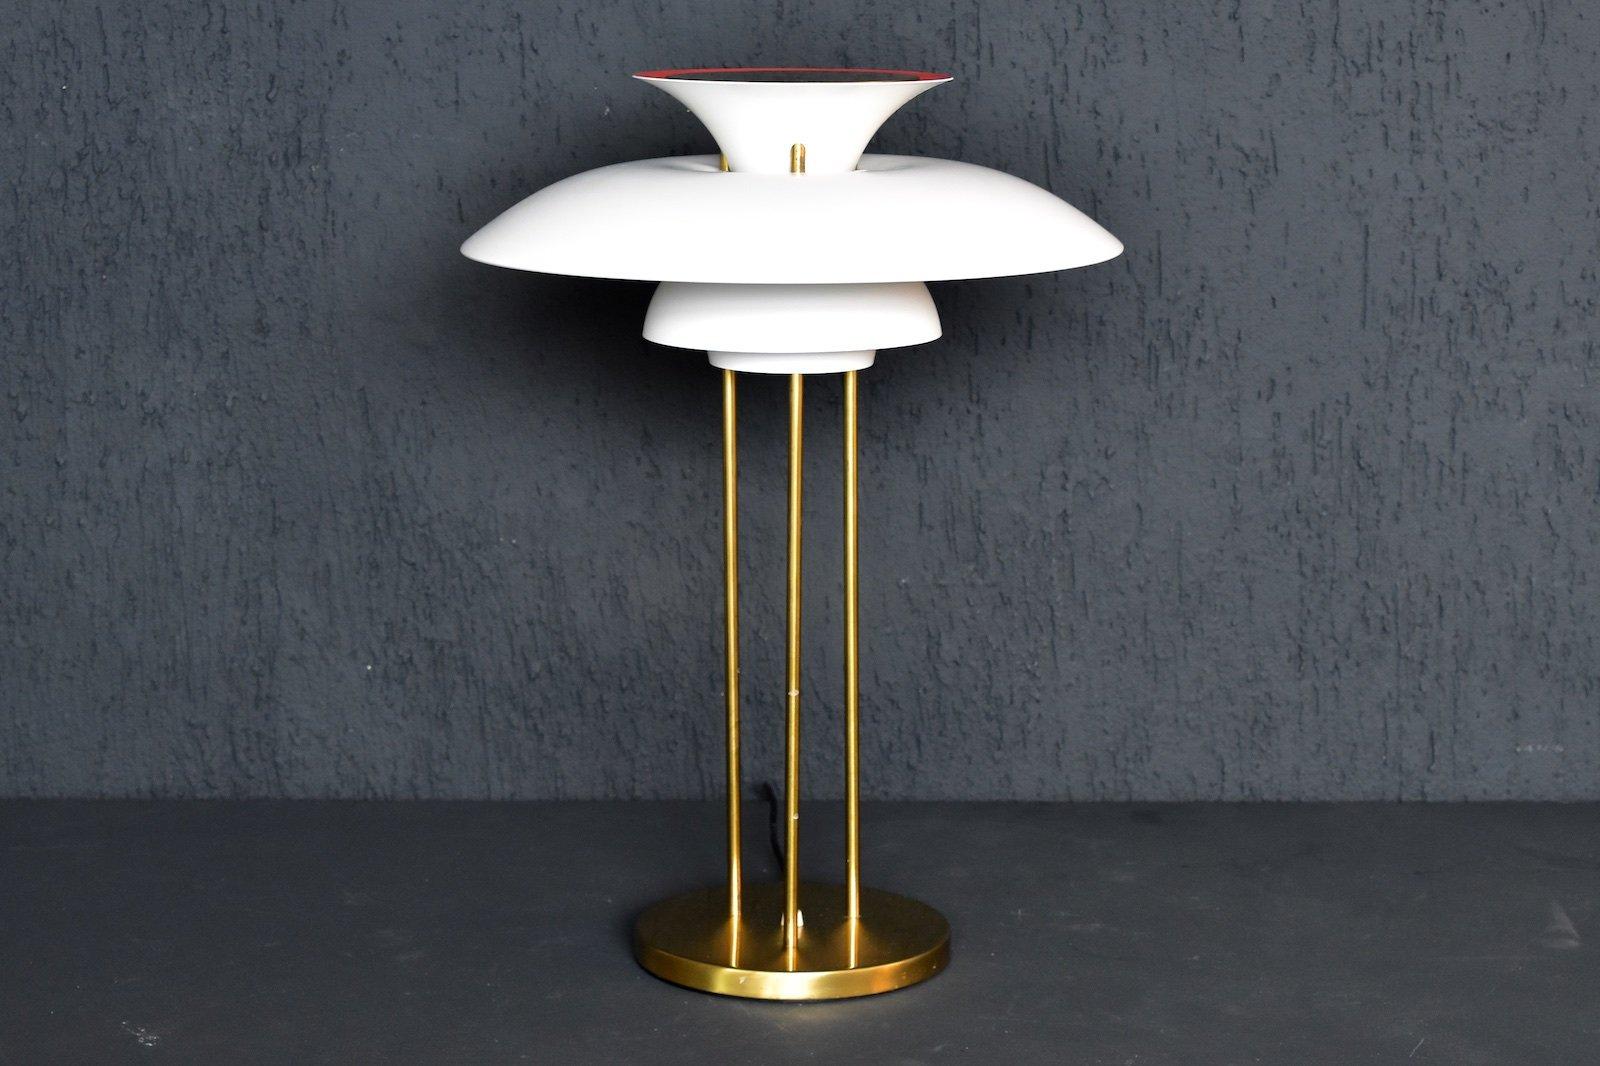 vintage danish ph5 table lamp by poul henningsen for louis poulsen for sale at pamono. Black Bedroom Furniture Sets. Home Design Ideas